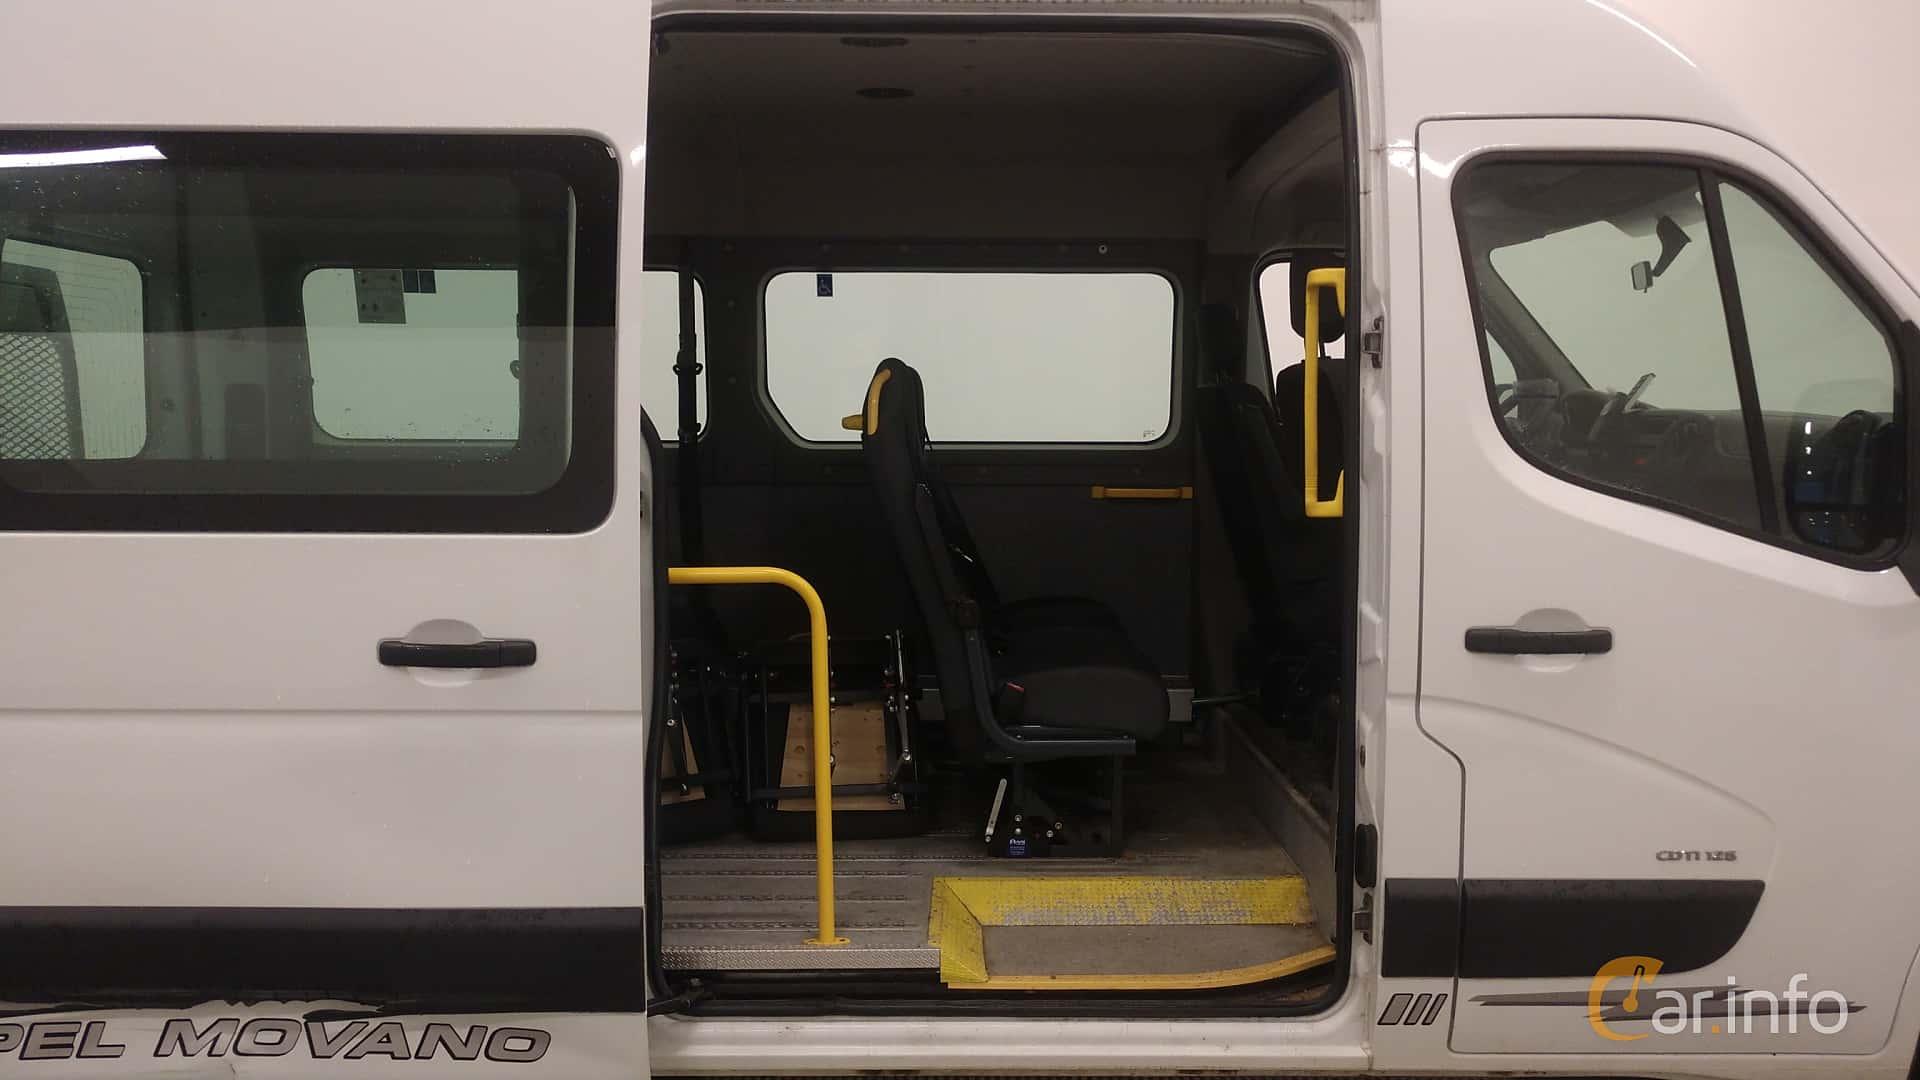 Opel Movano Minibus 2.3 CDTI Manuell, 125hk, 2012